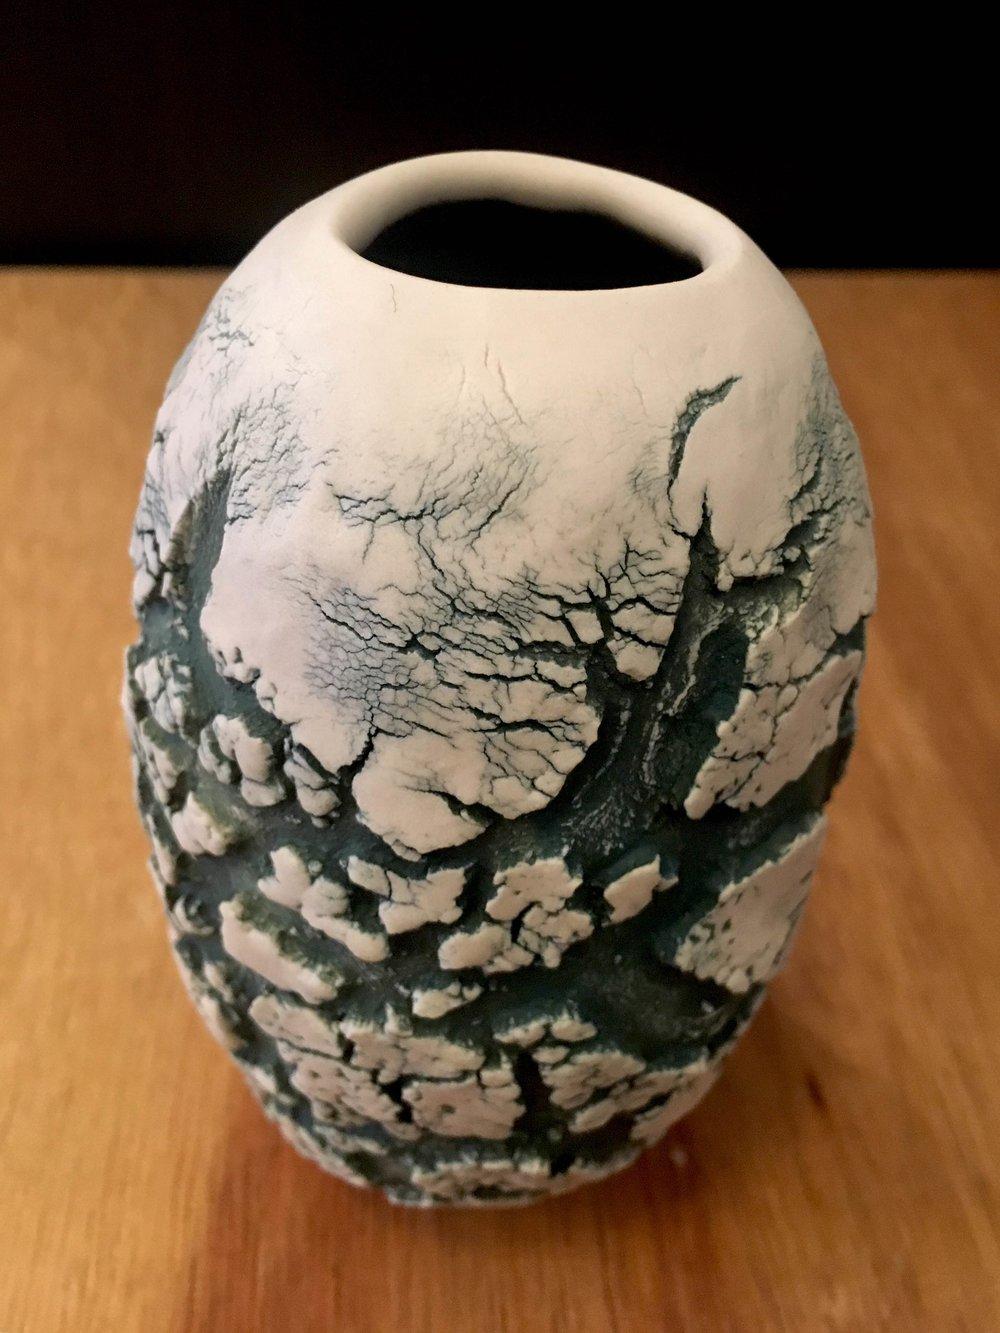 "Small hand-formed porcelain vase, 5"" x 3"" diameter, sold"